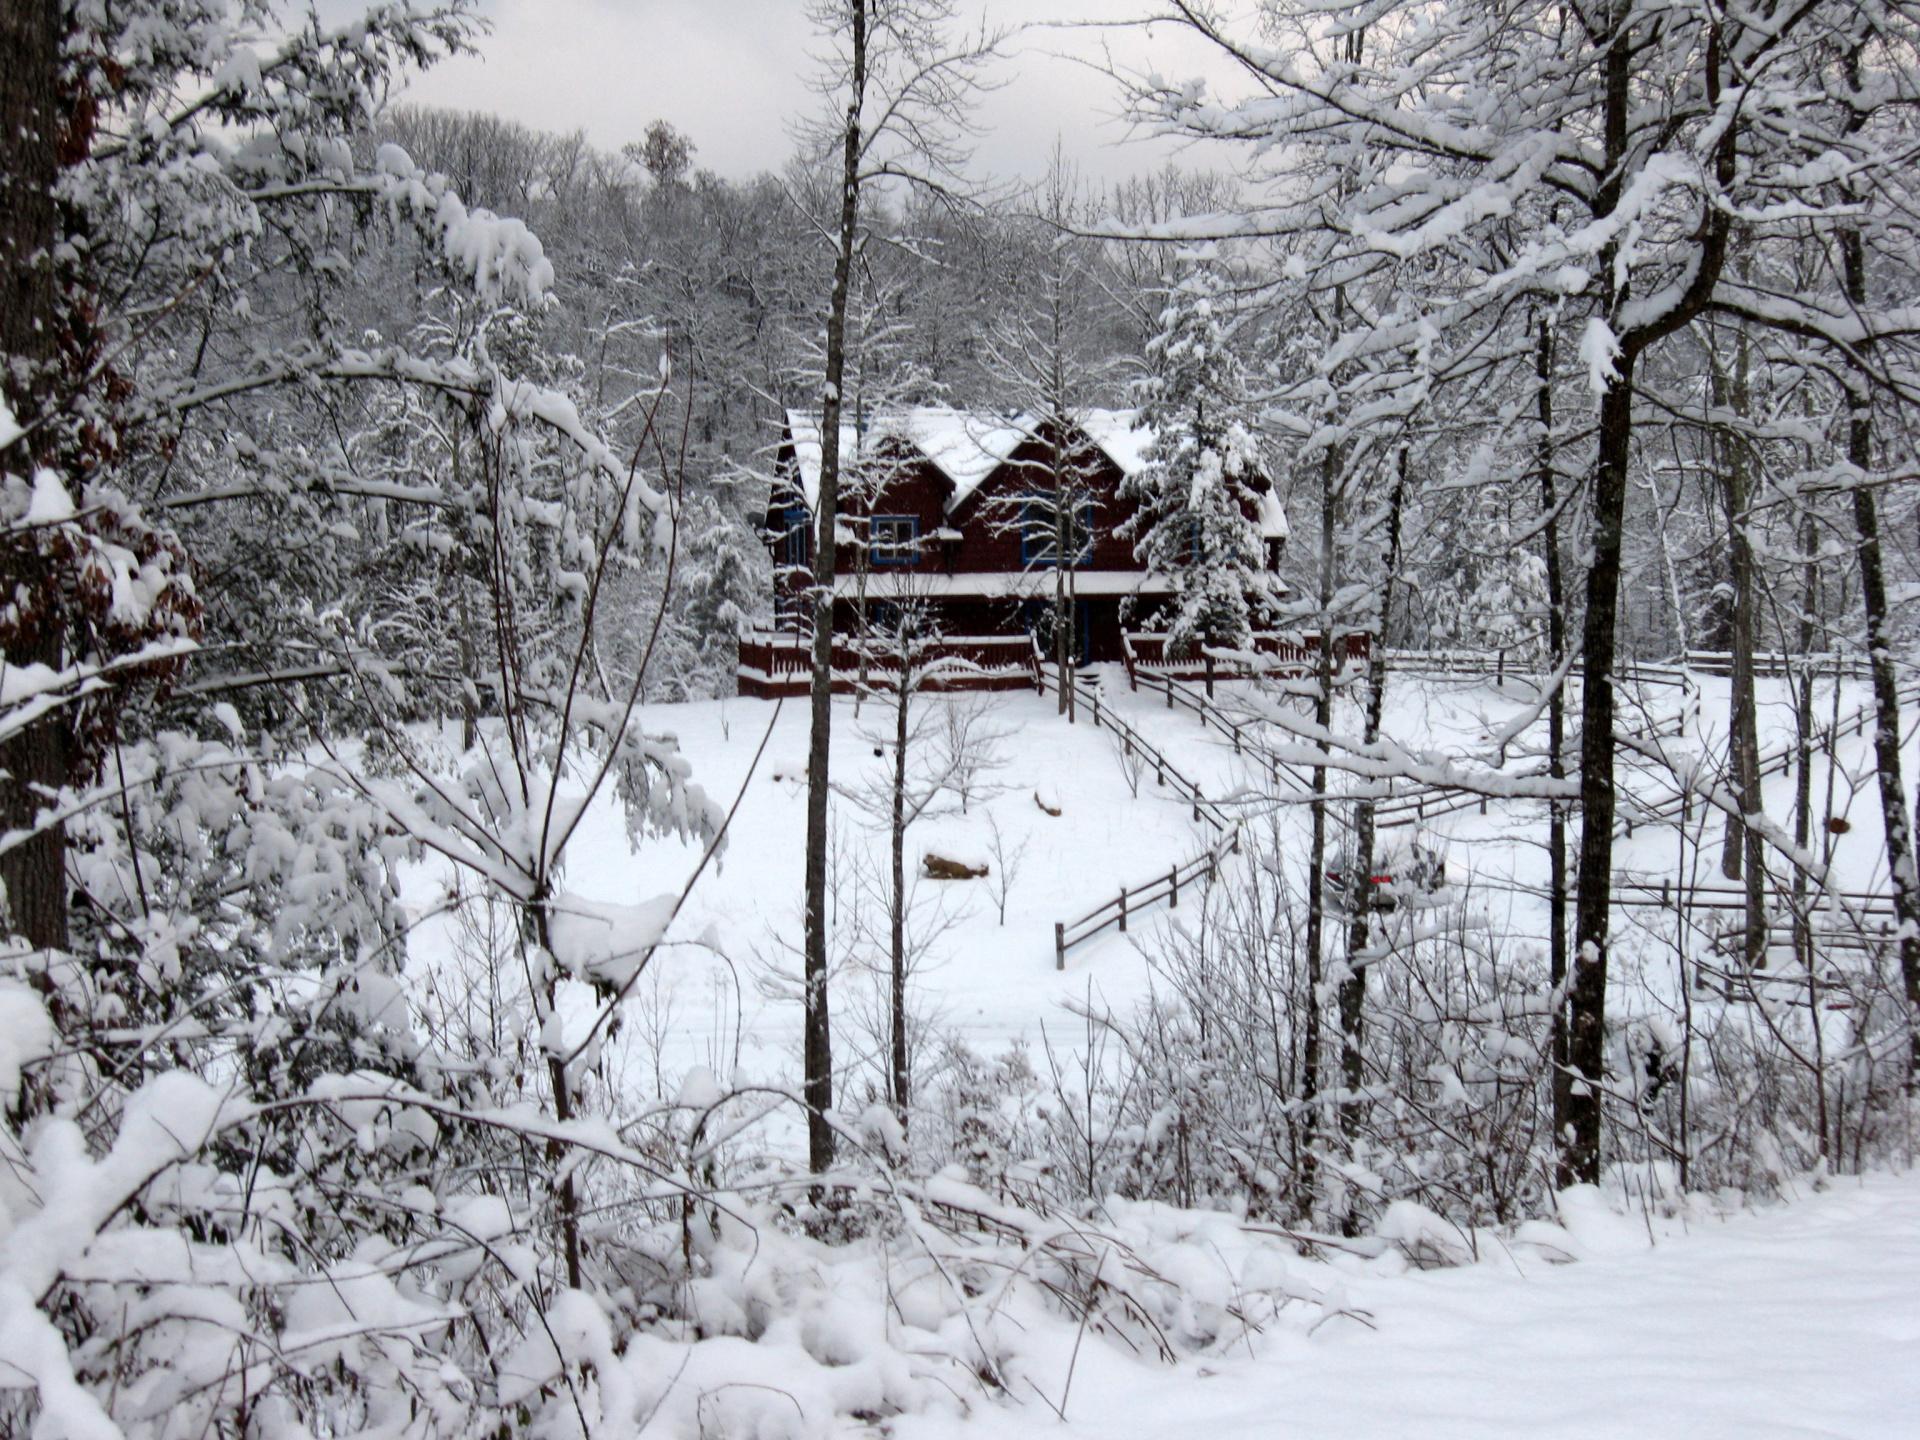 Blue Mountain Lodge Gatlinburg - snowy winter day